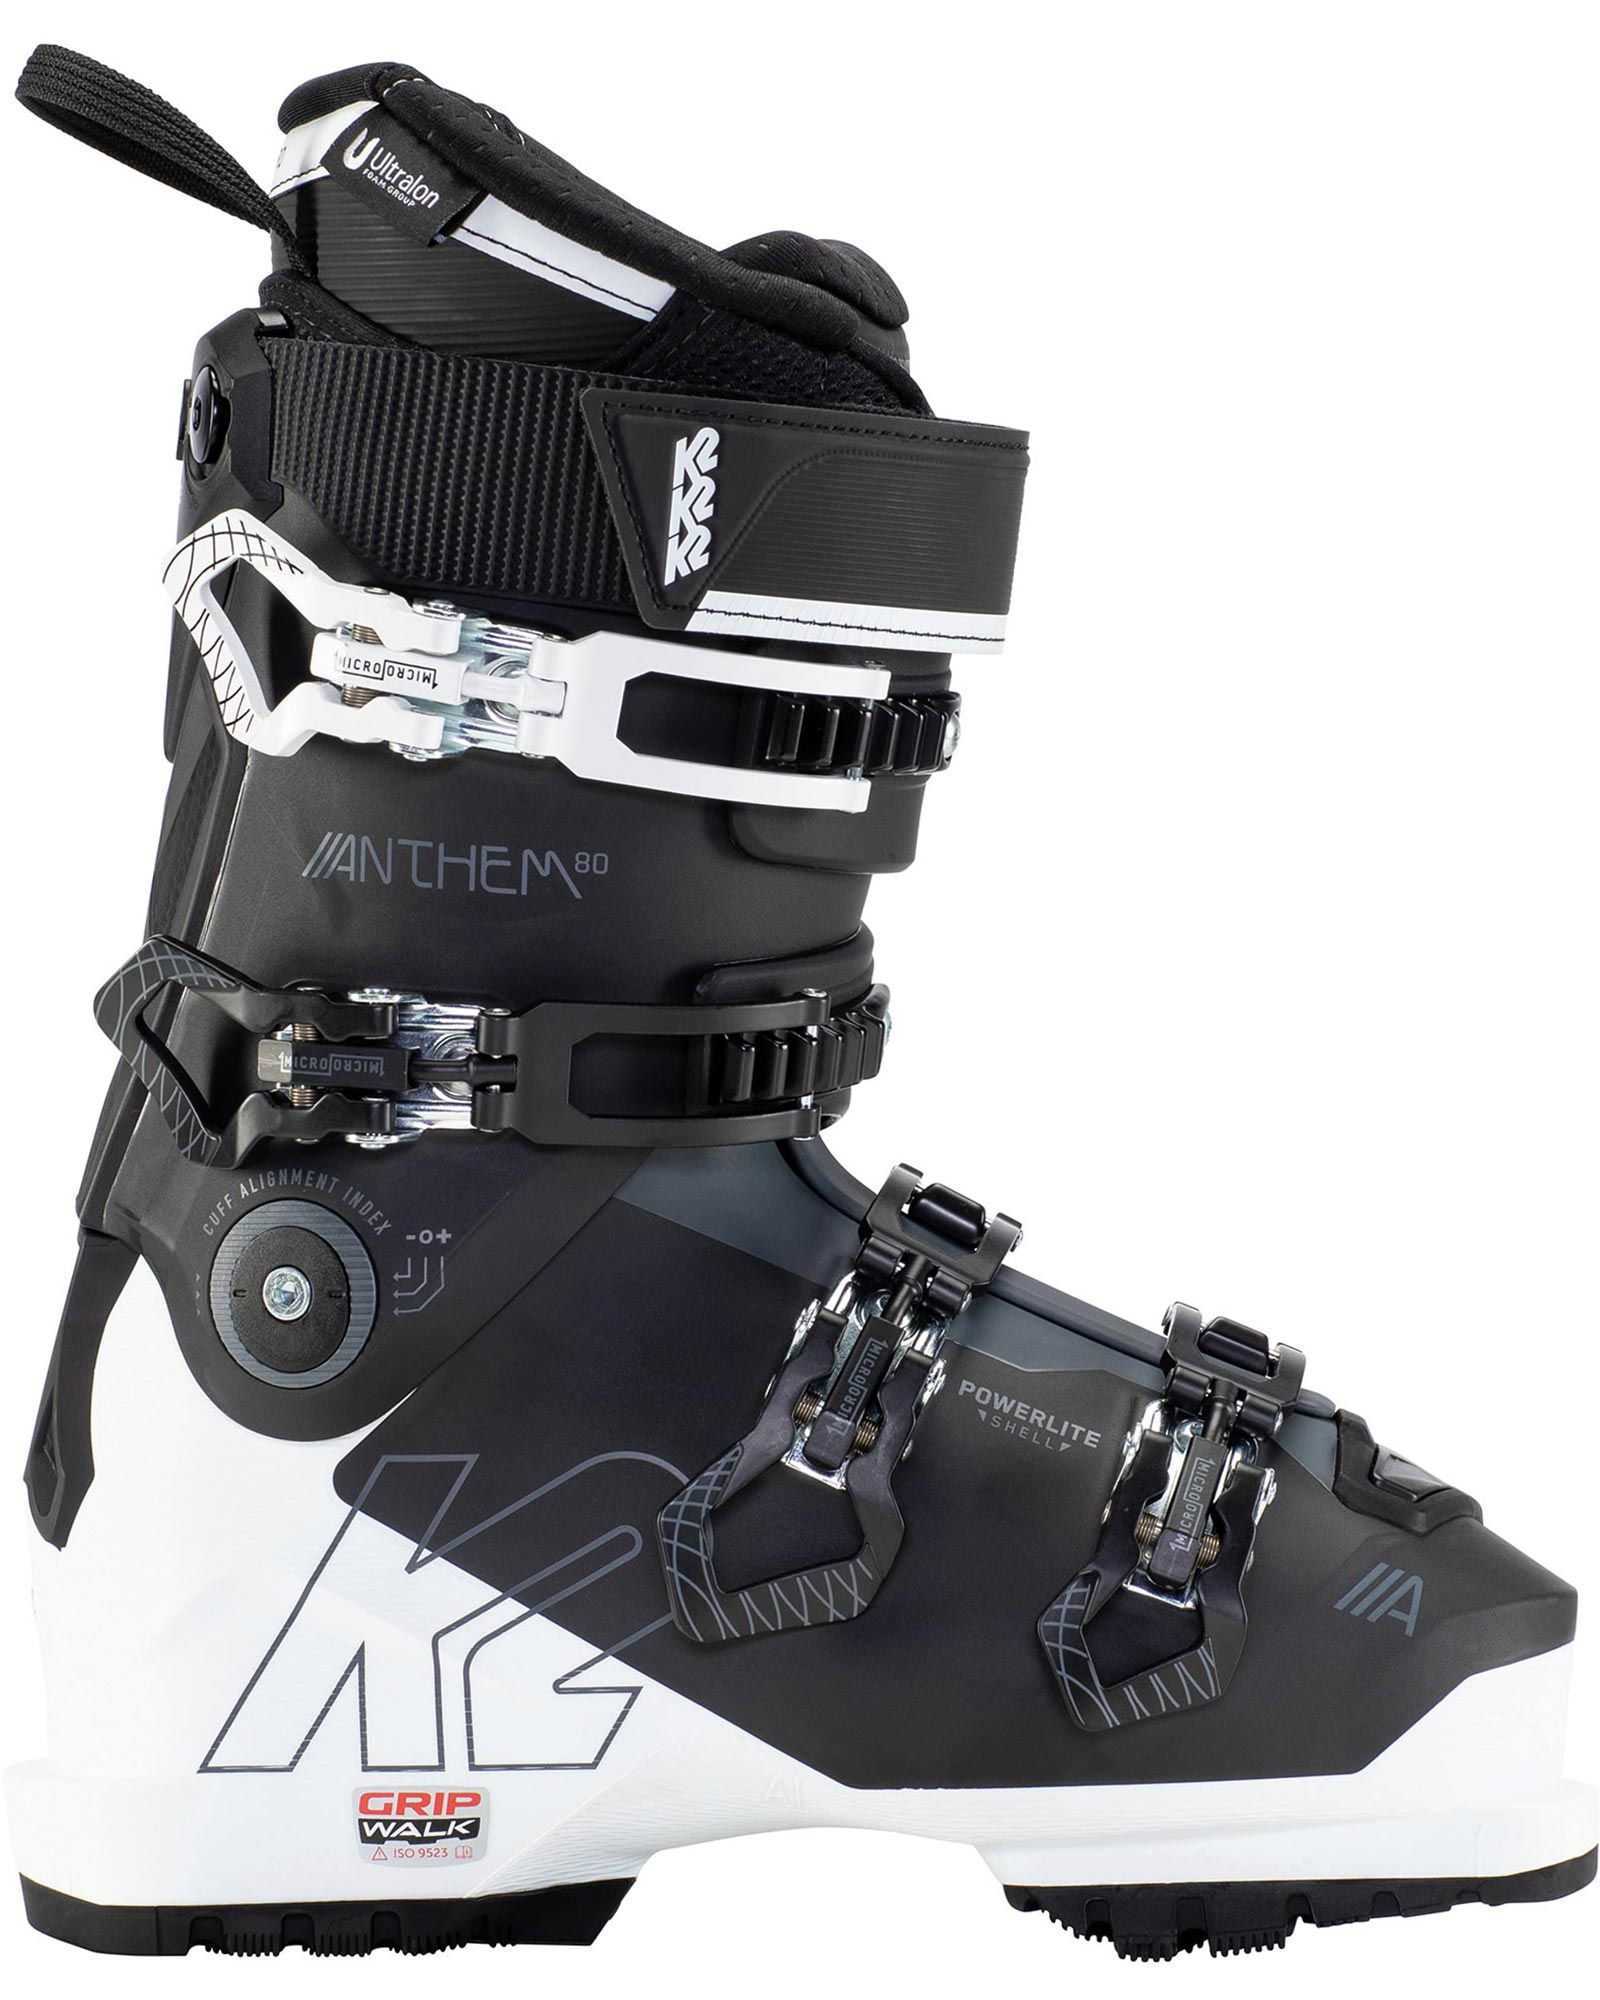 K2 Women's Anthem 80 MV GW W Ski Boots 2020 / 2021 0